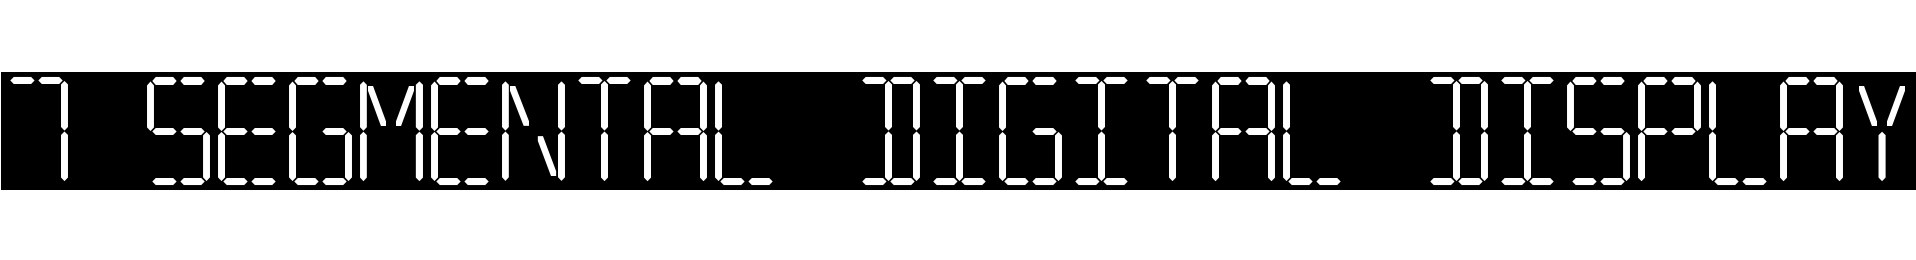 7 SEGMENTAL DIGITAL DISPLAY